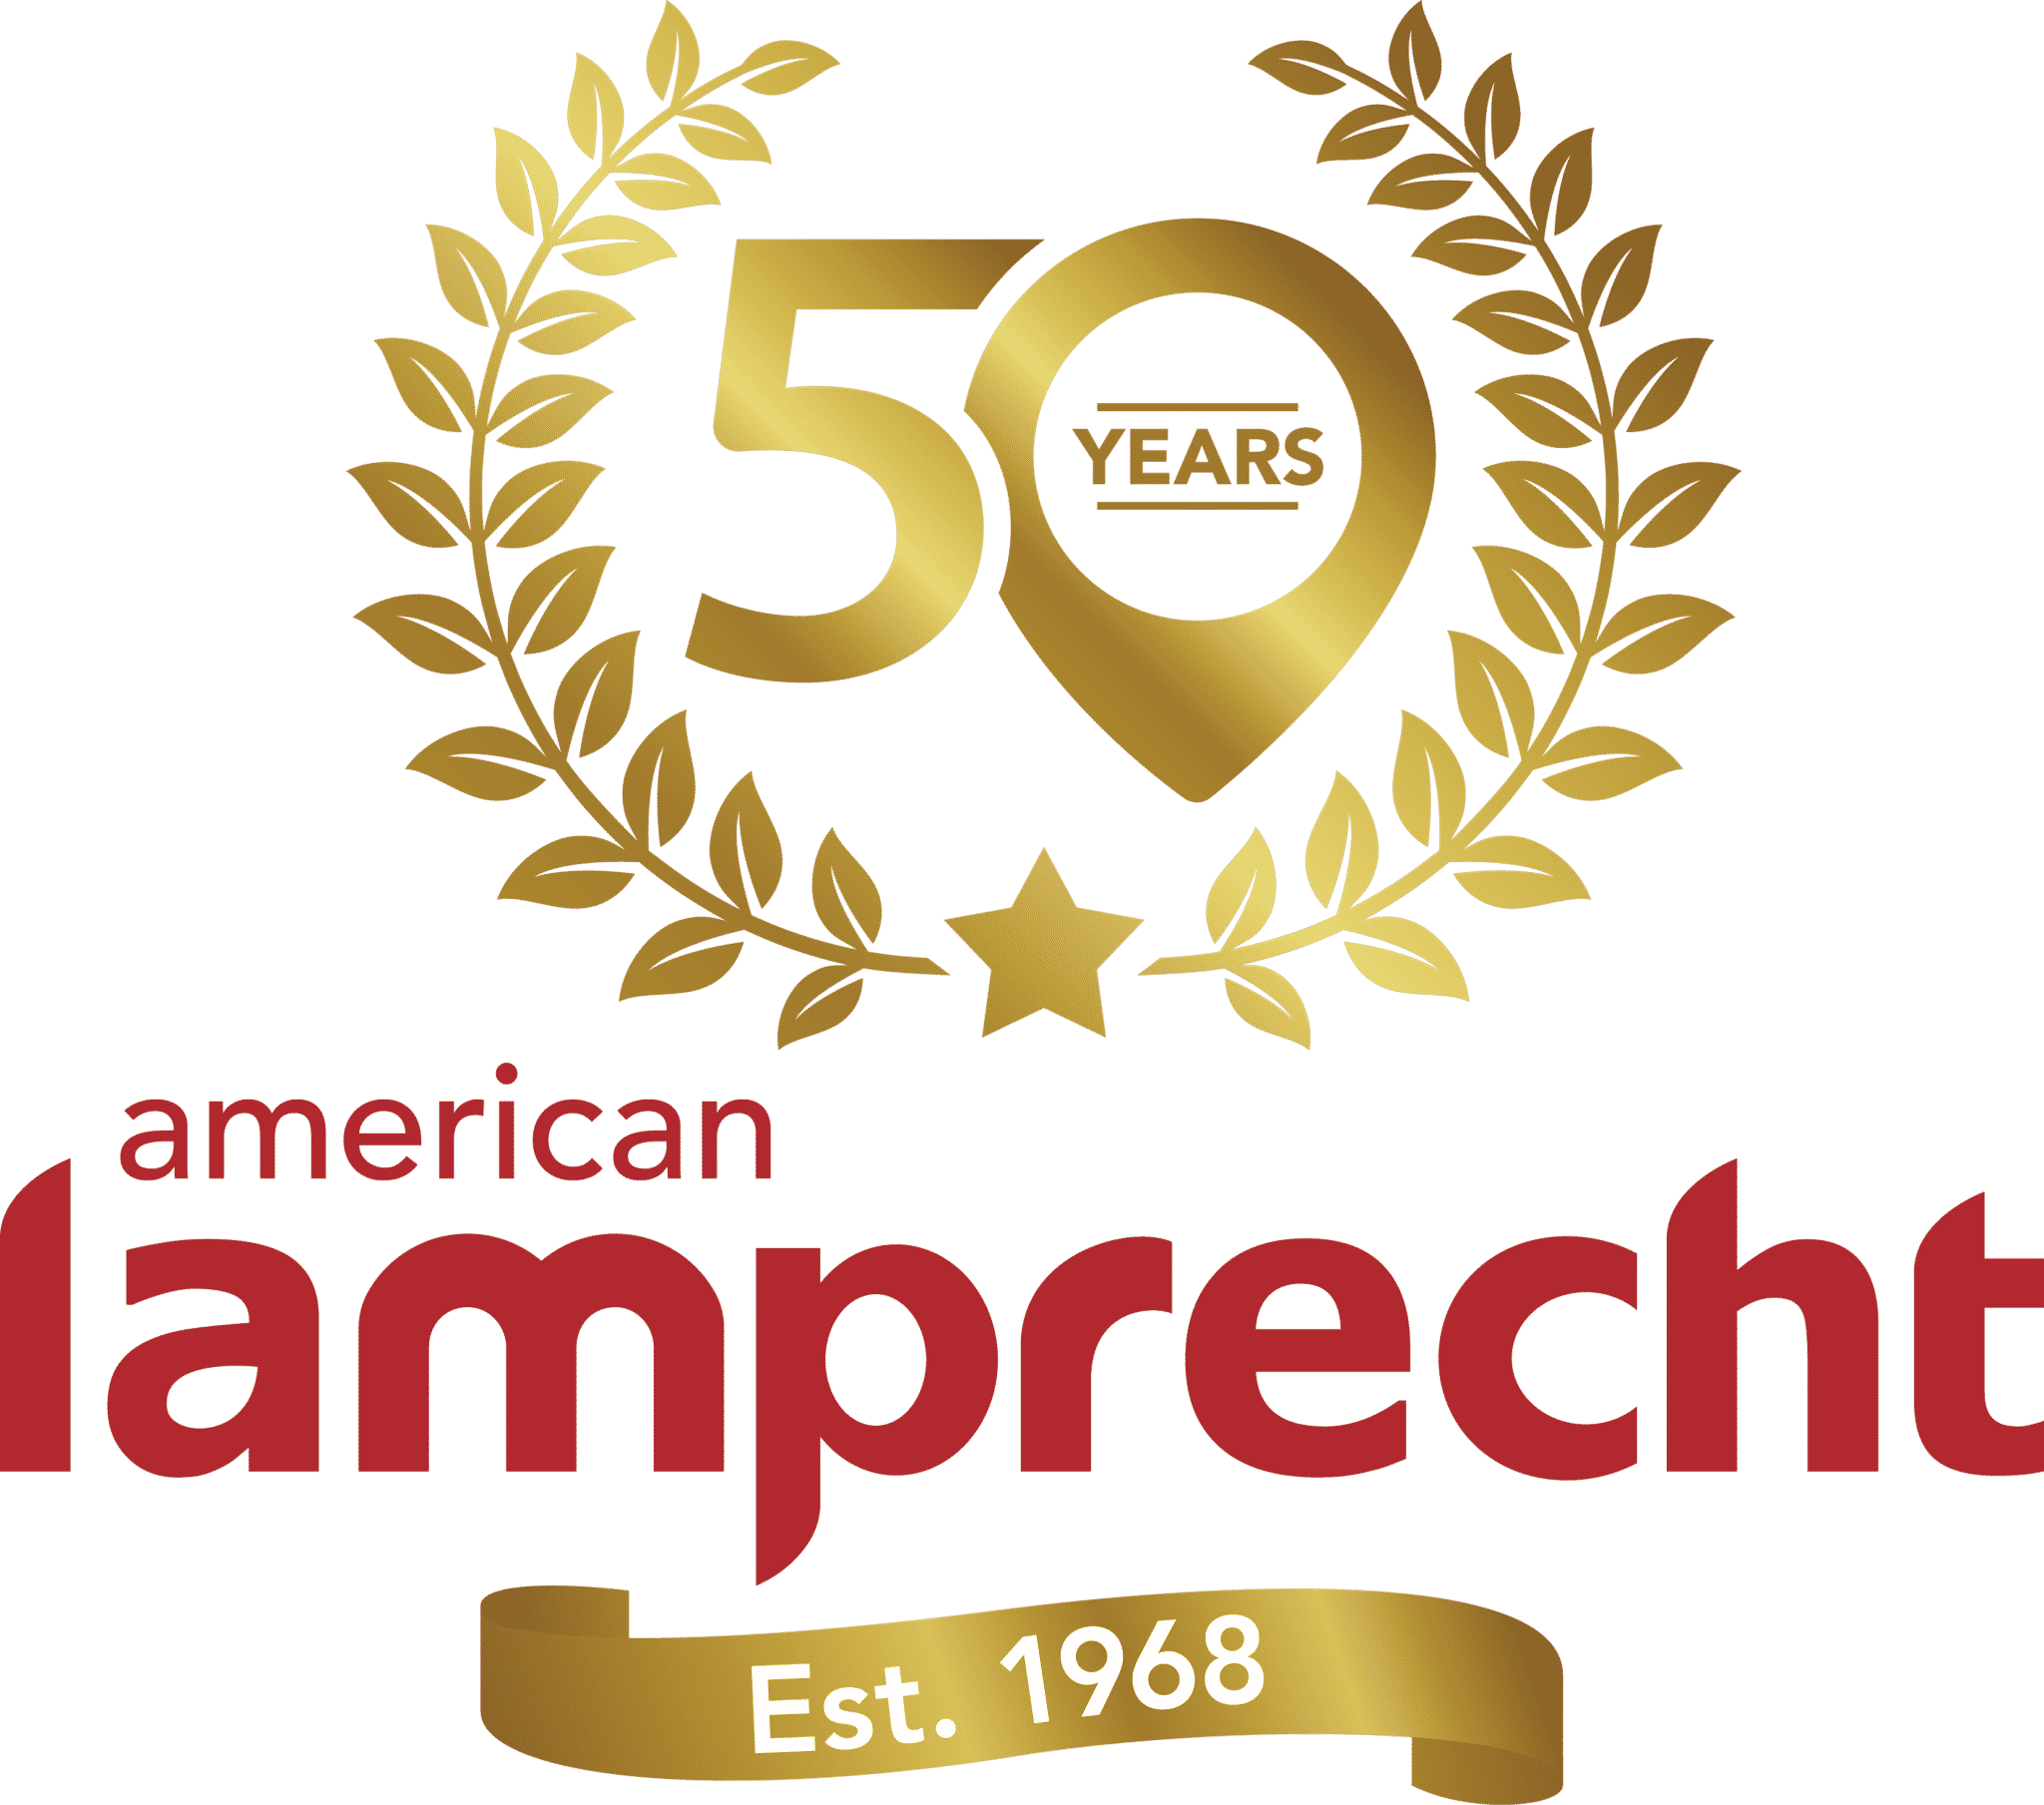 50 Years American Lamprecht logo